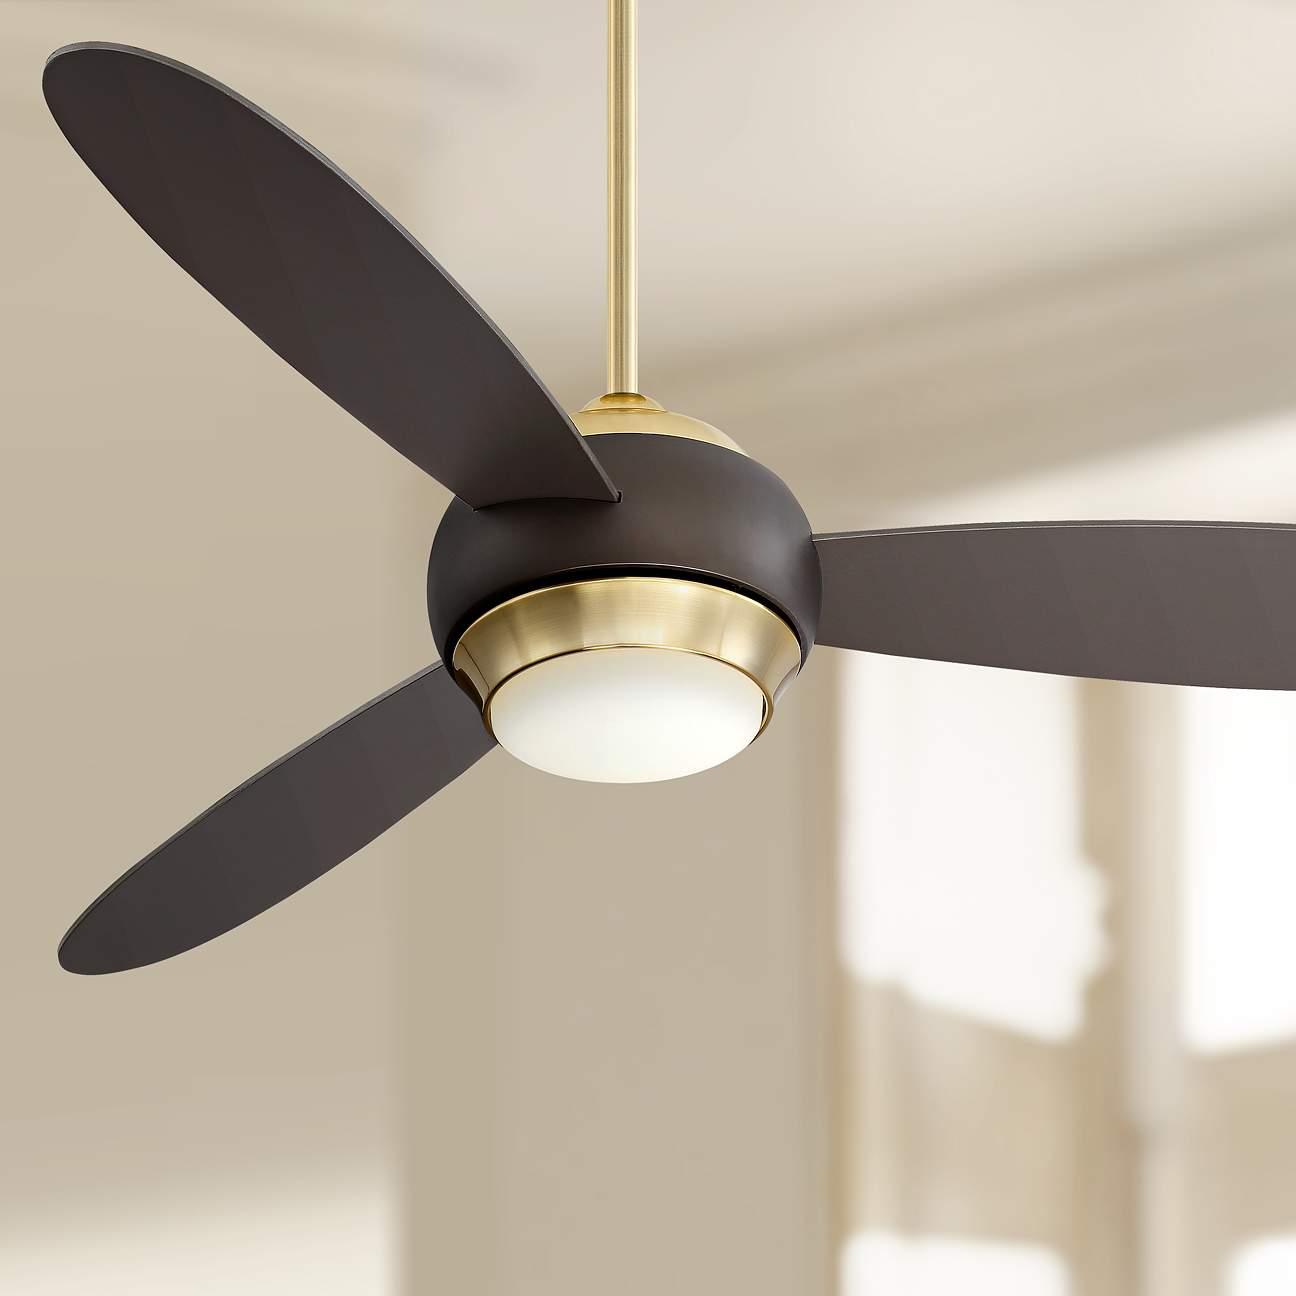 Help Circulate Basement Air With a Ceiling Fan Light